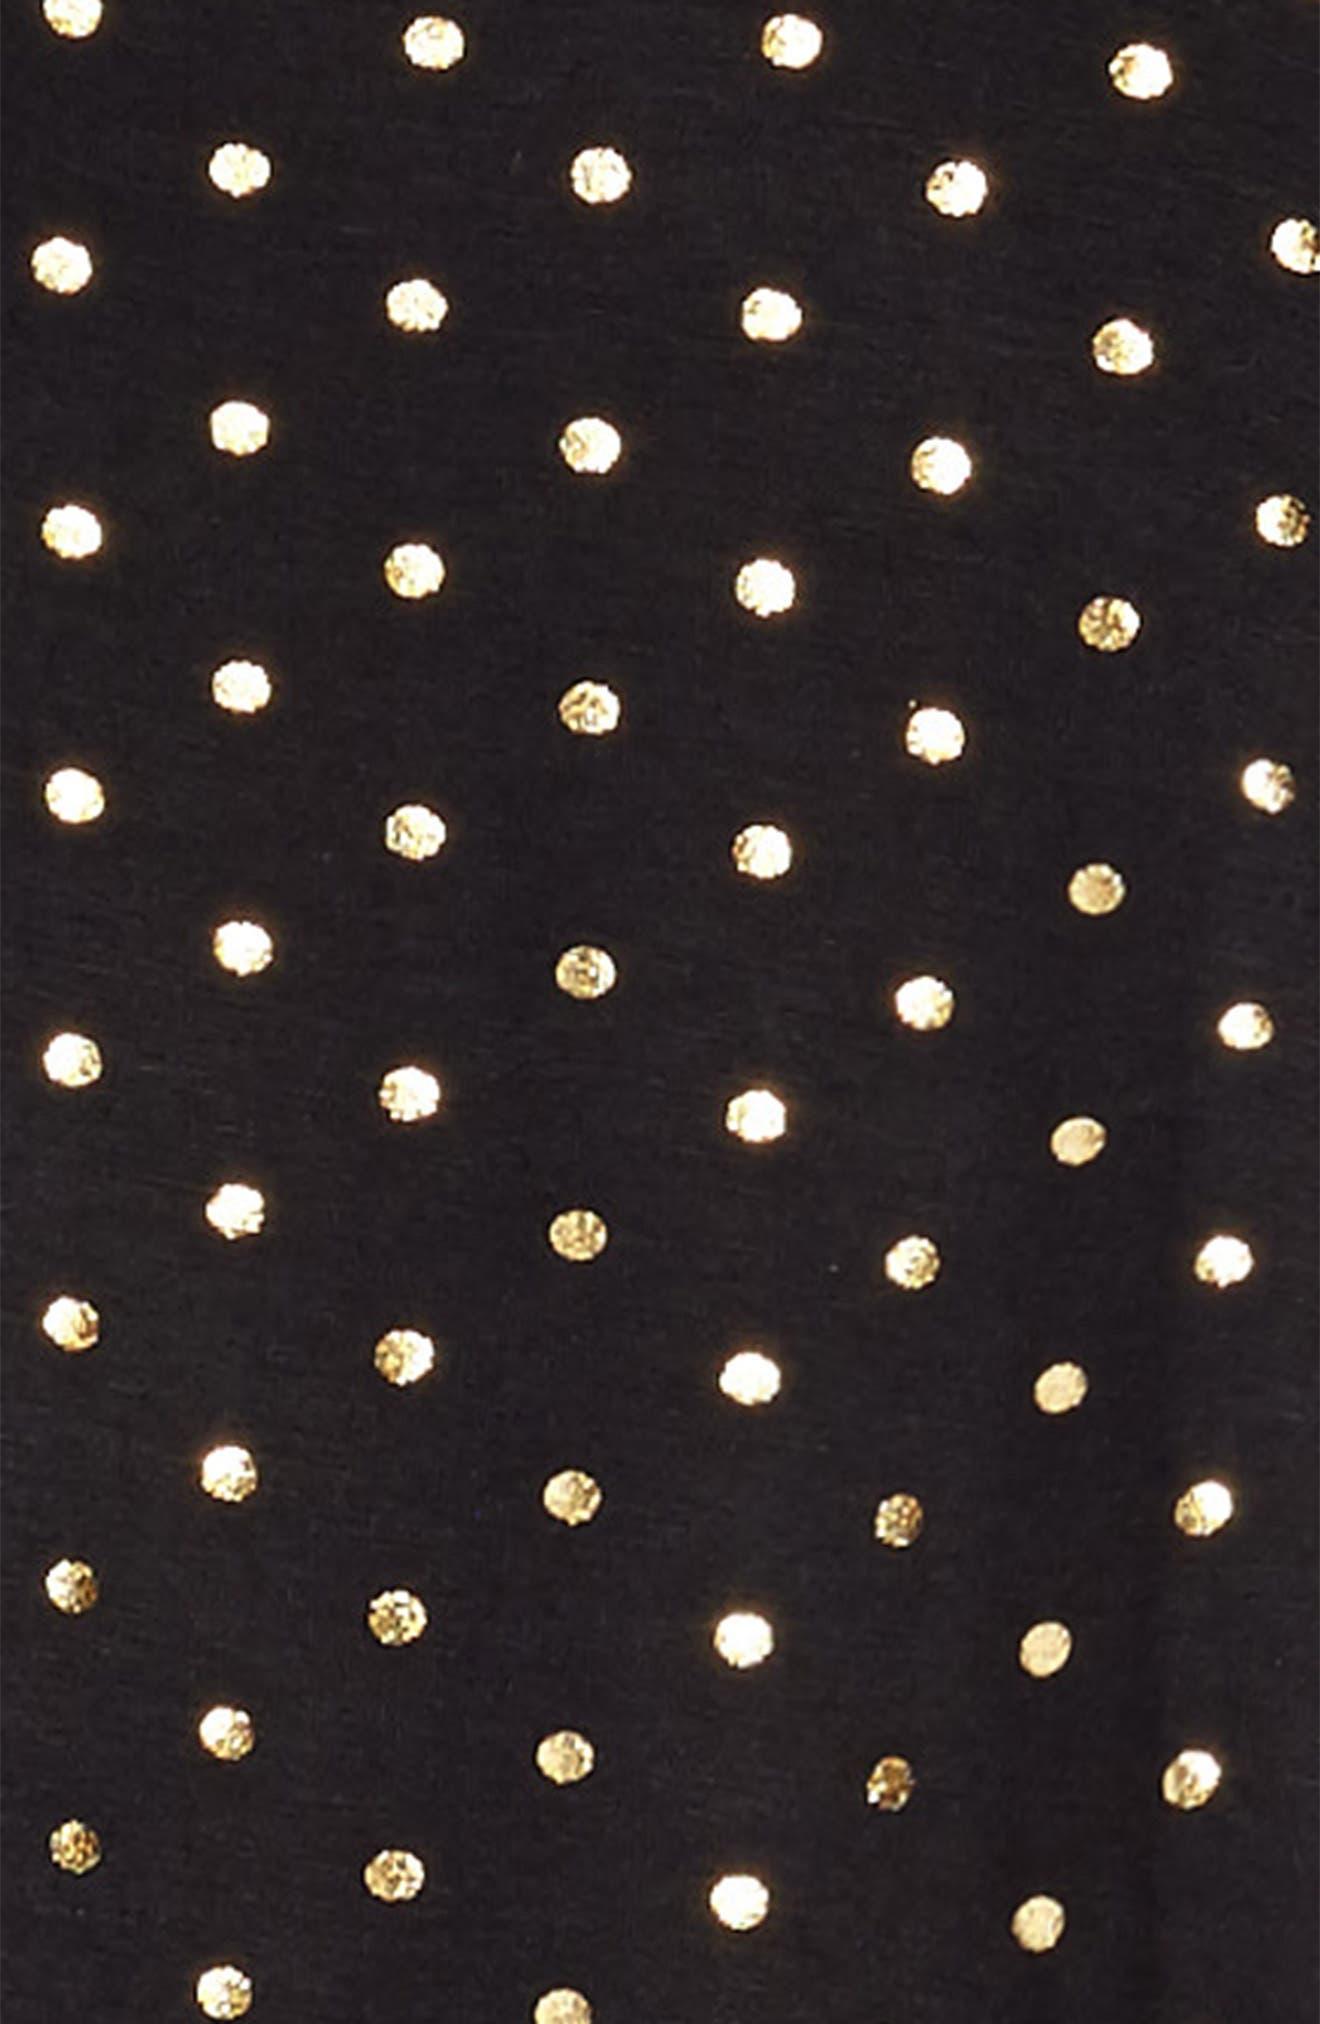 Foil Polka Dot Jersey Dress,                             Alternate thumbnail 3, color,                             Black/ Gold Foil